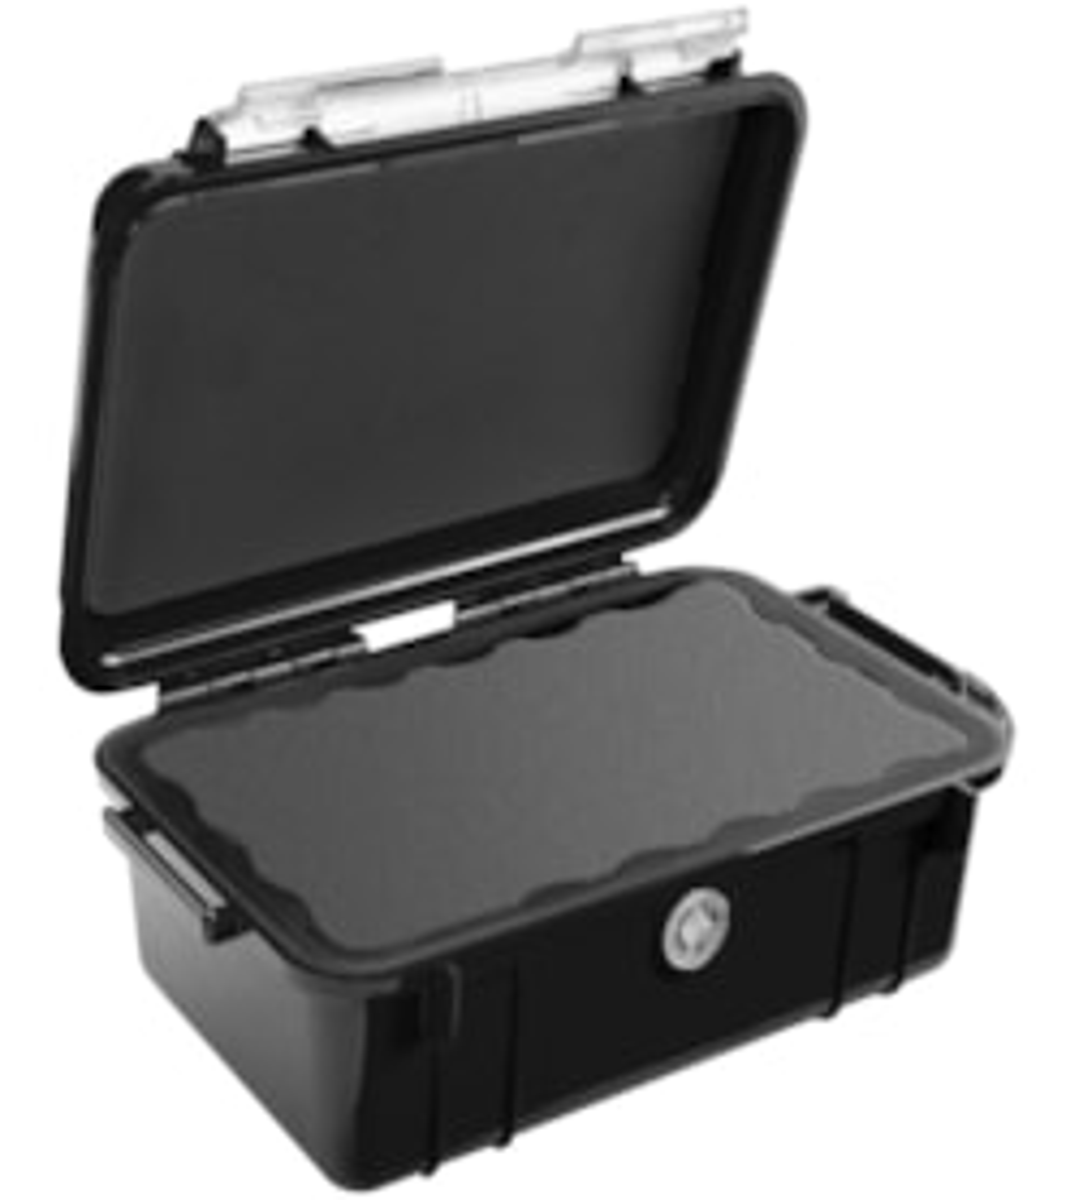 Pelican Micro Case 1050 Carrying Case Camera, Cellular Phone - Black